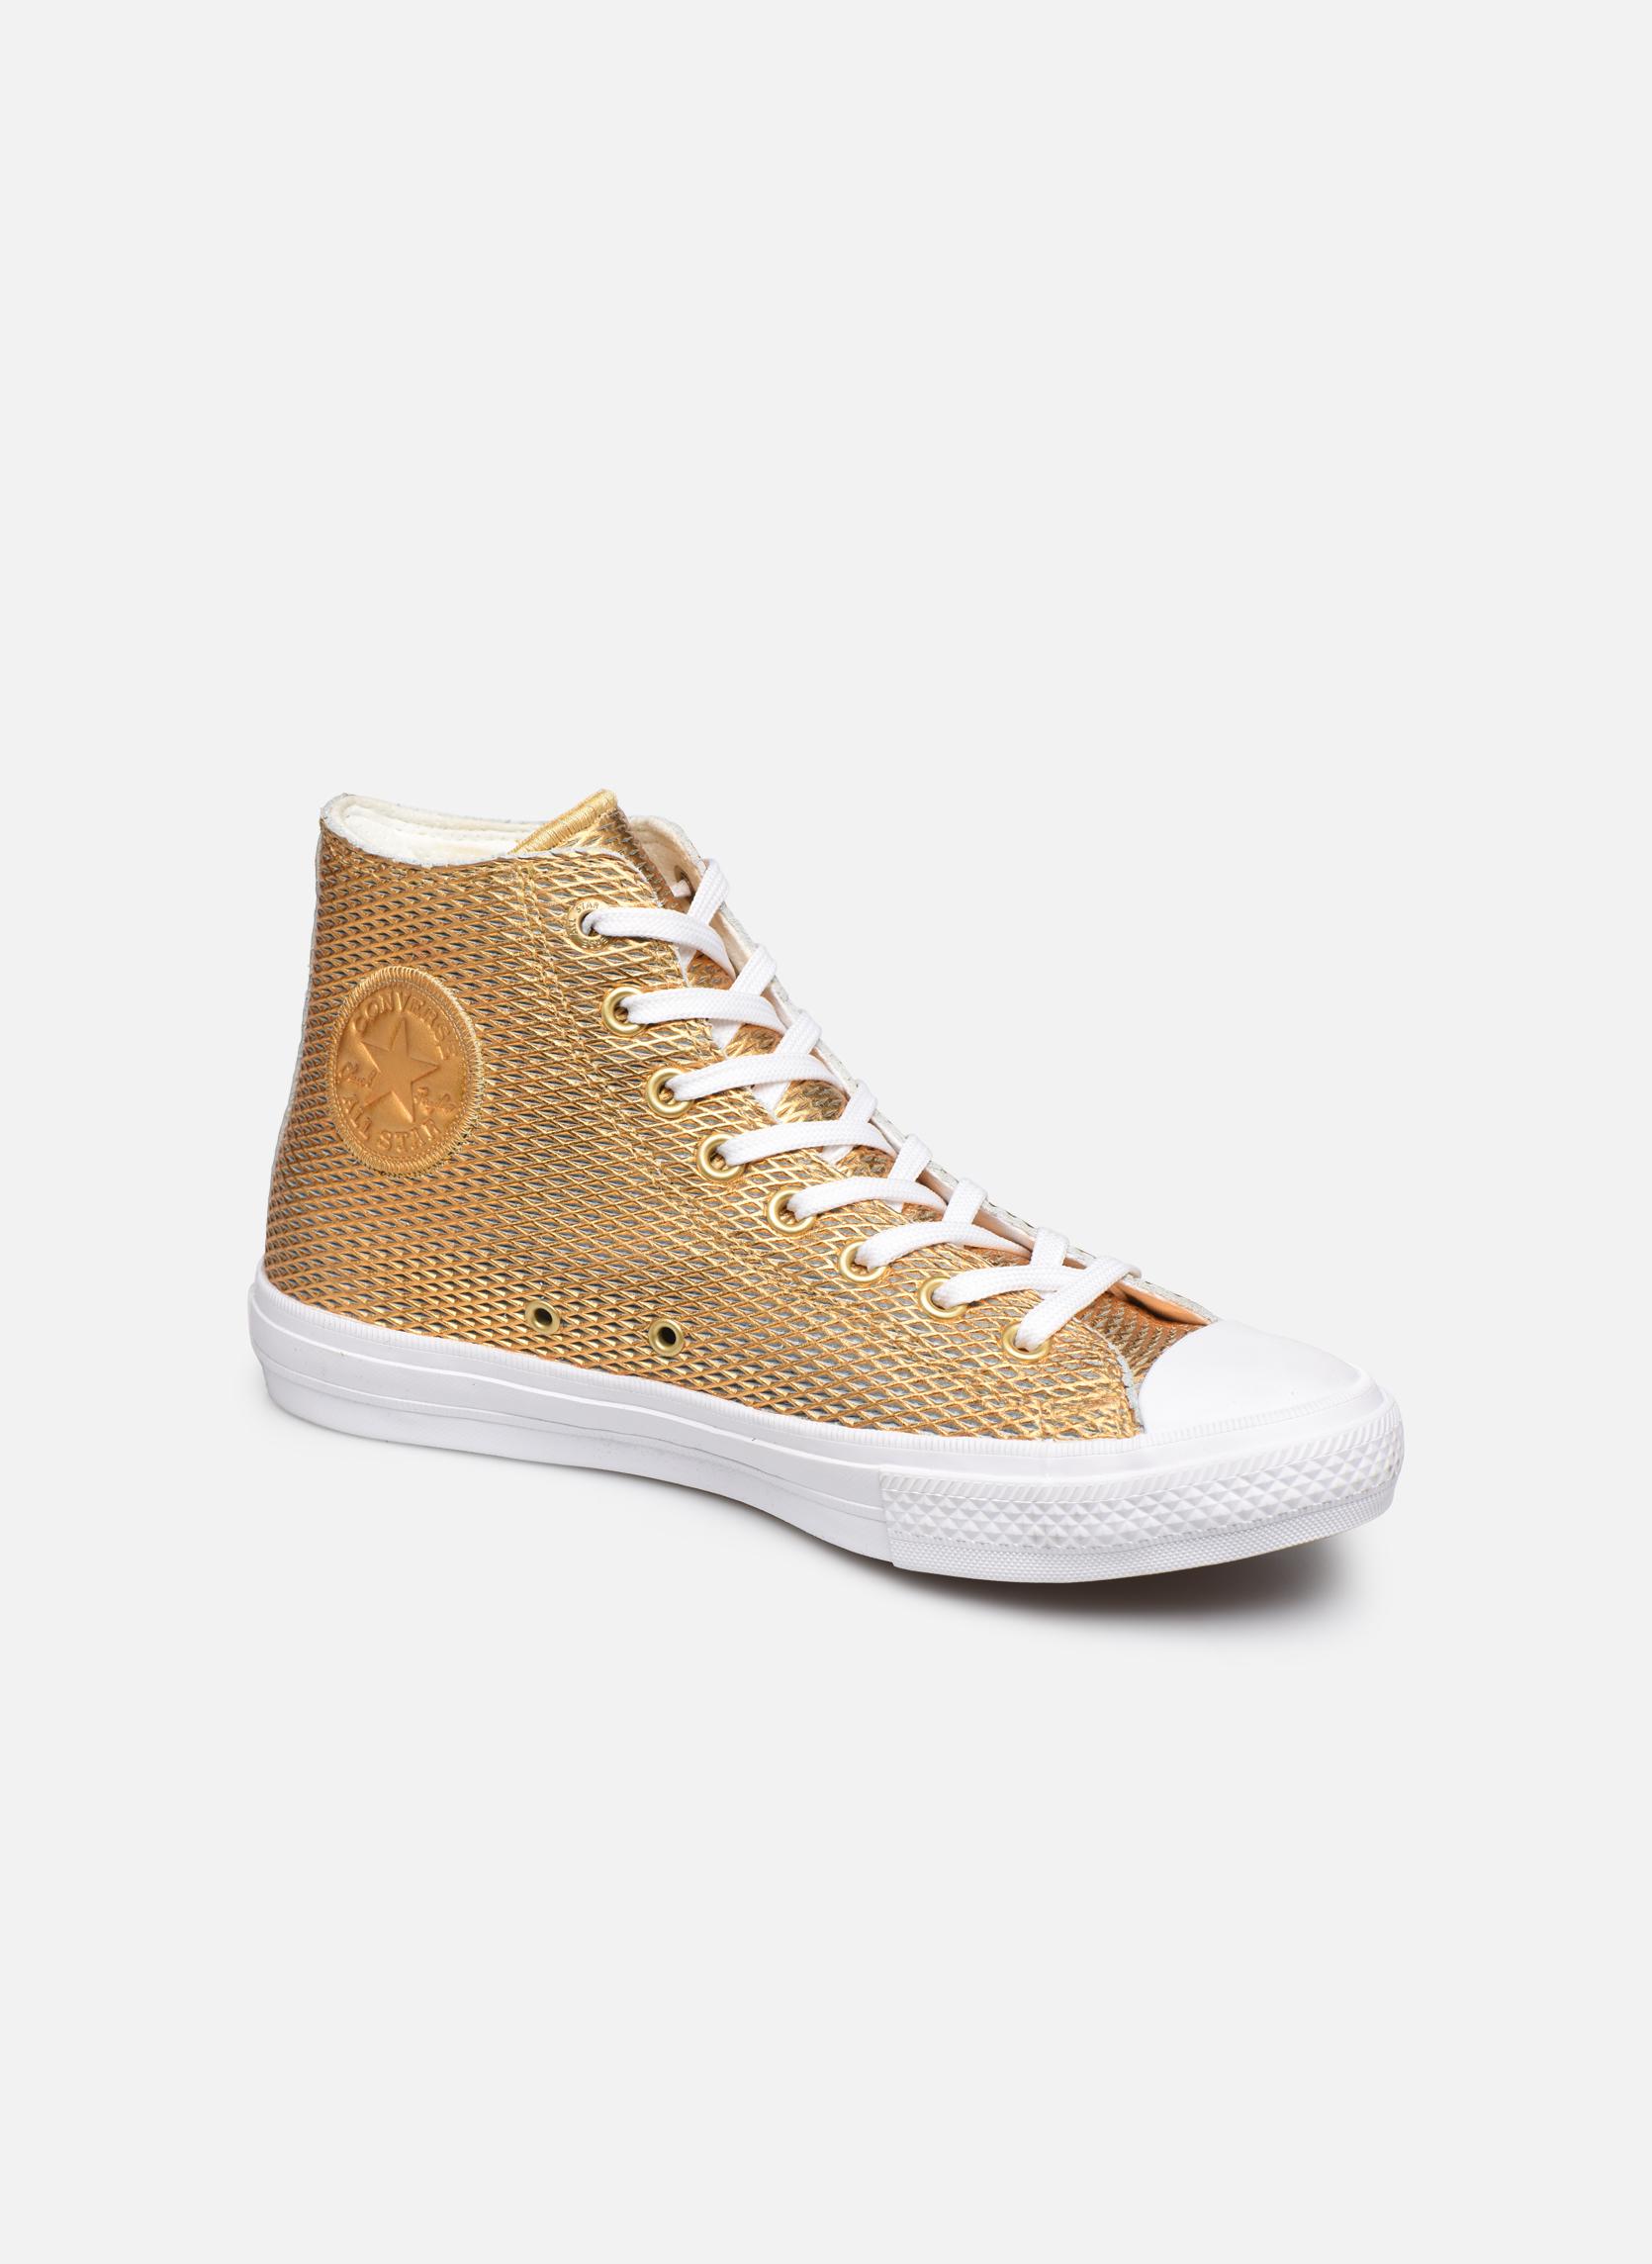 Sneaker Converse Chuck Taylor All Star II Hi Perf Metallic Leather